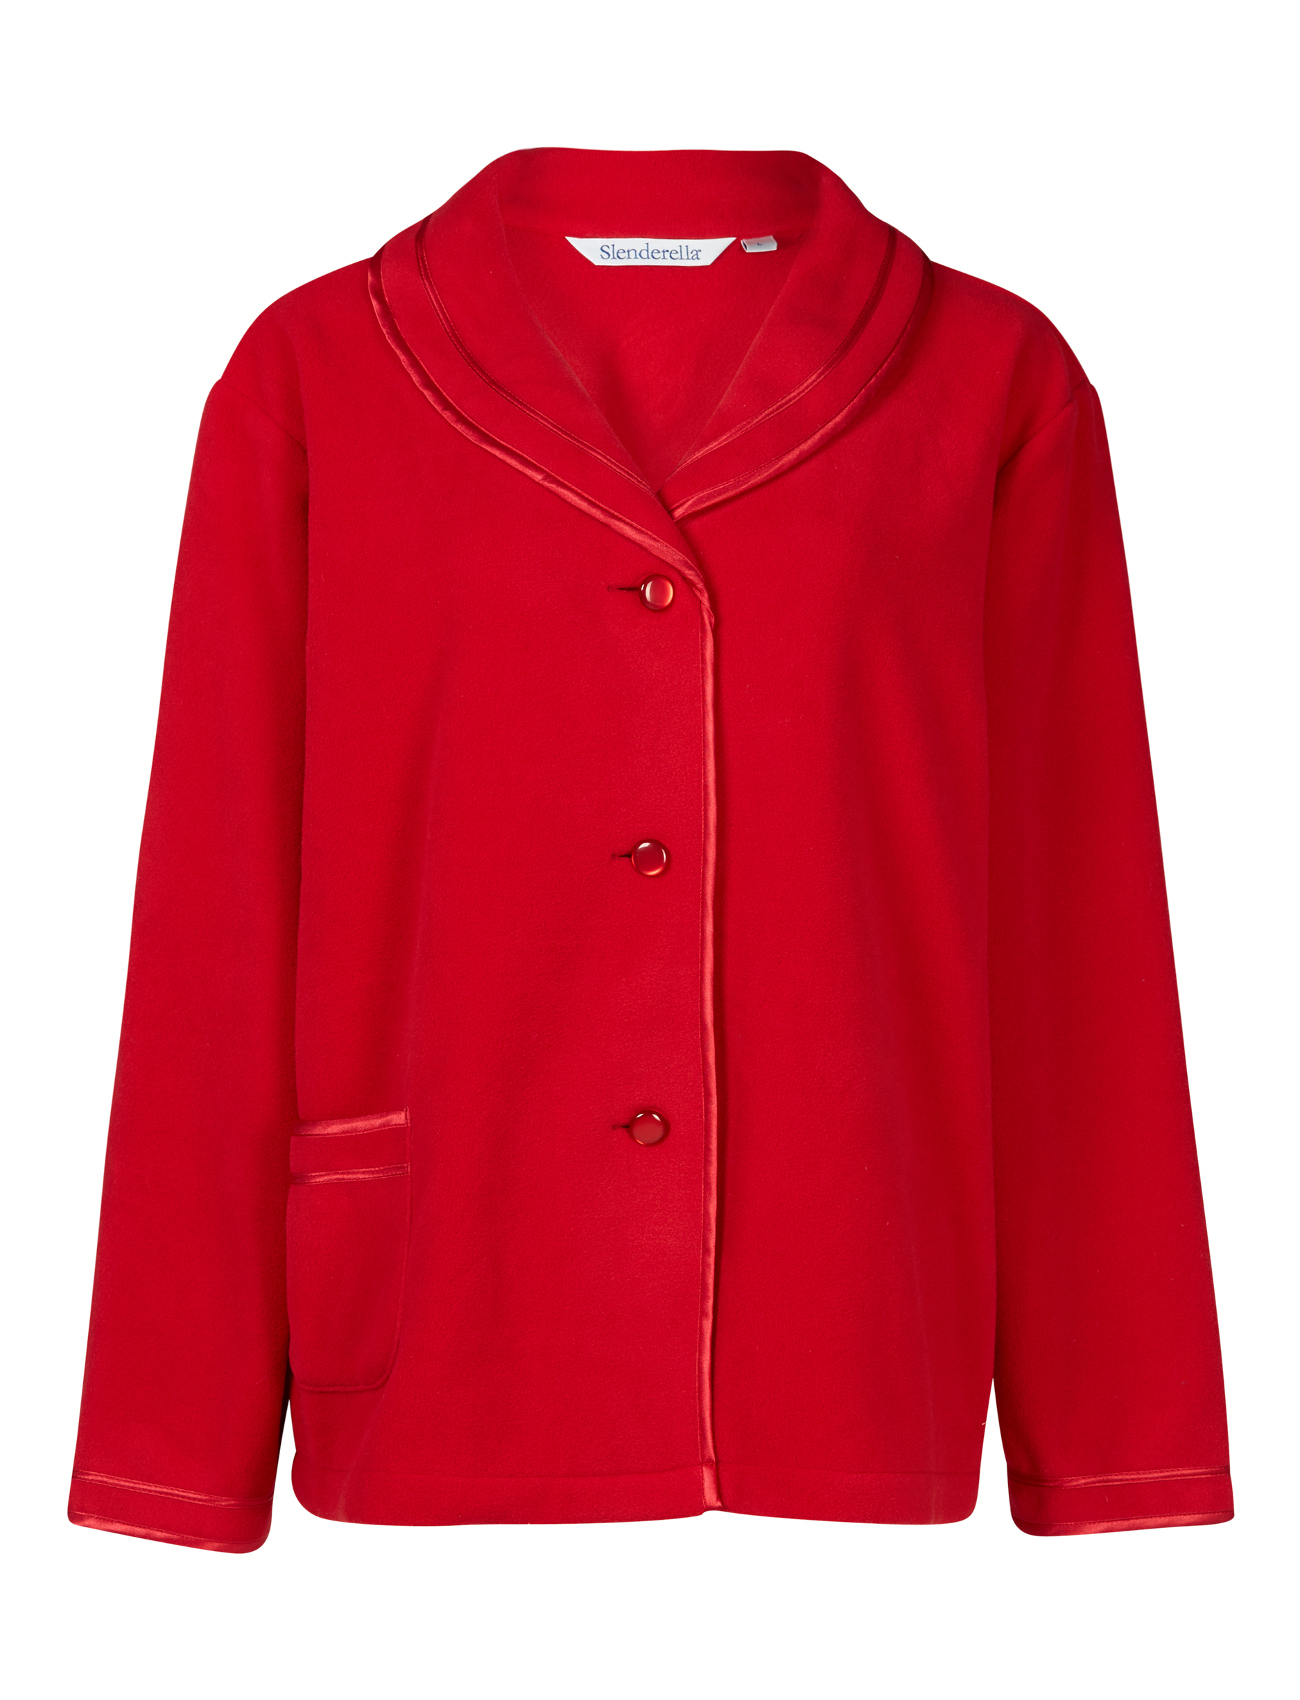 269ba1655d Slenderella Womens Bed Jacket or Dressing Gown Anti Pill Polar ...